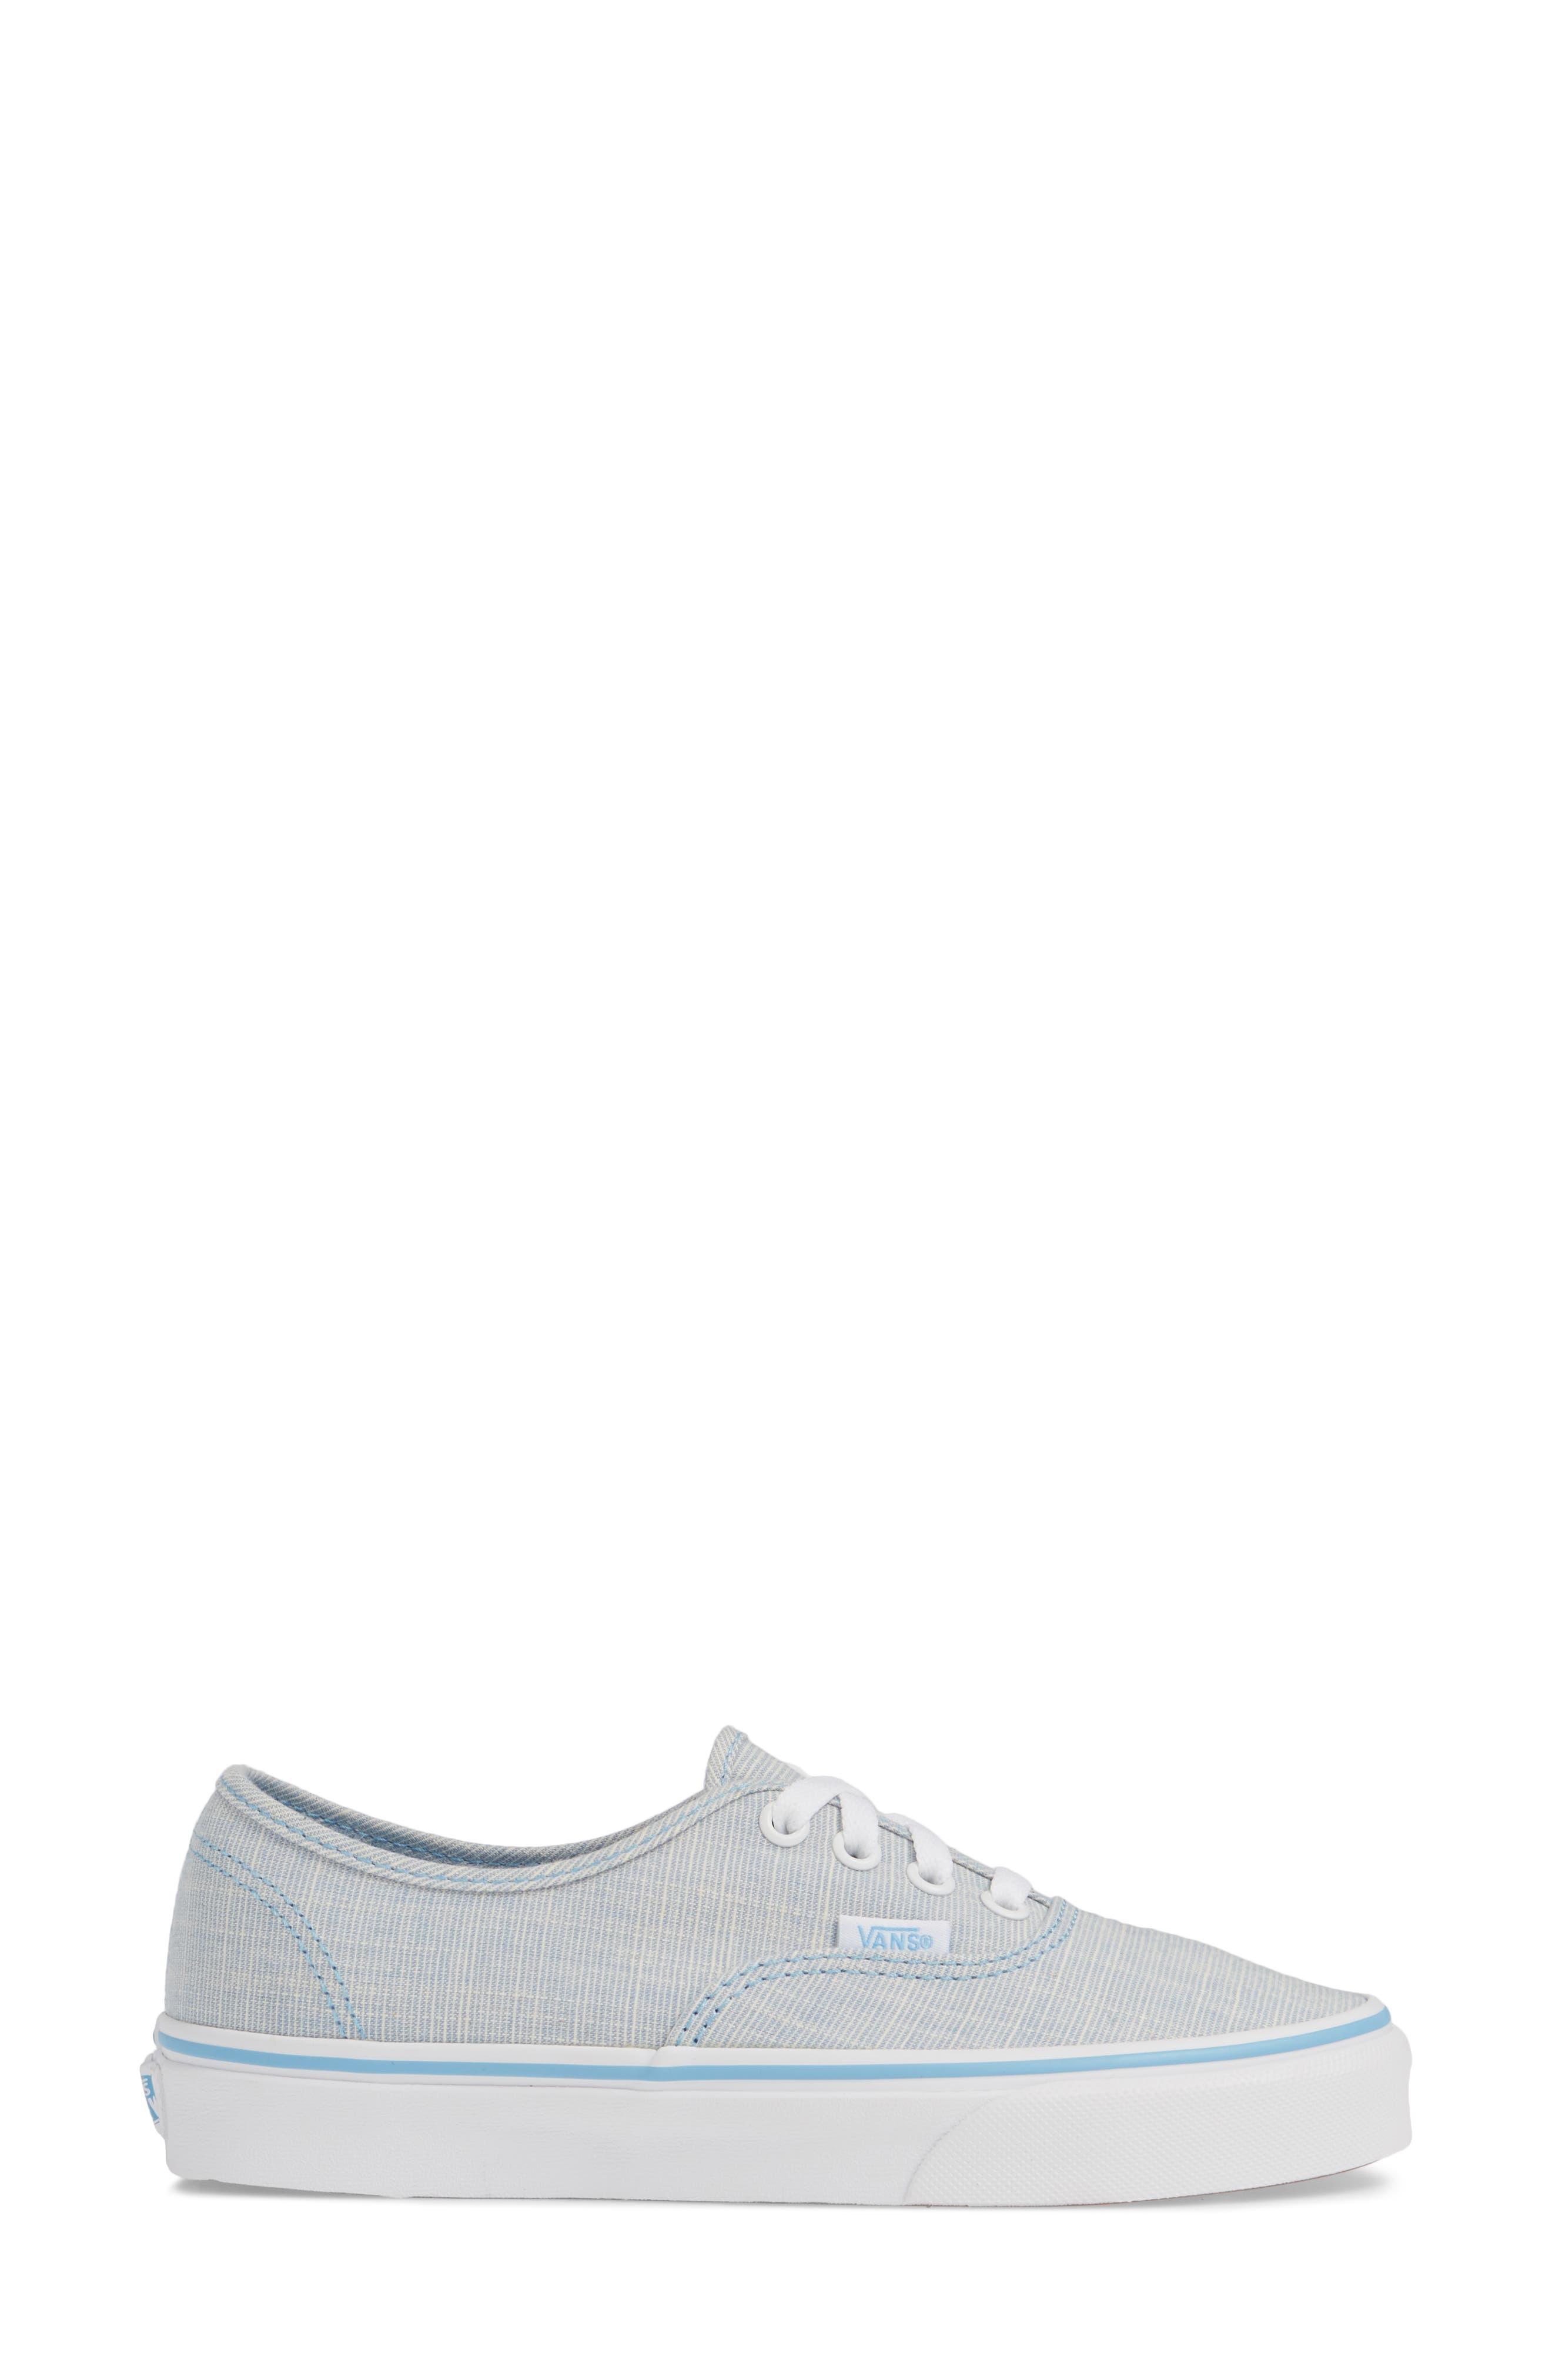 ,                             'Authentic' Sneaker,                             Alternate thumbnail 158, color,                             025